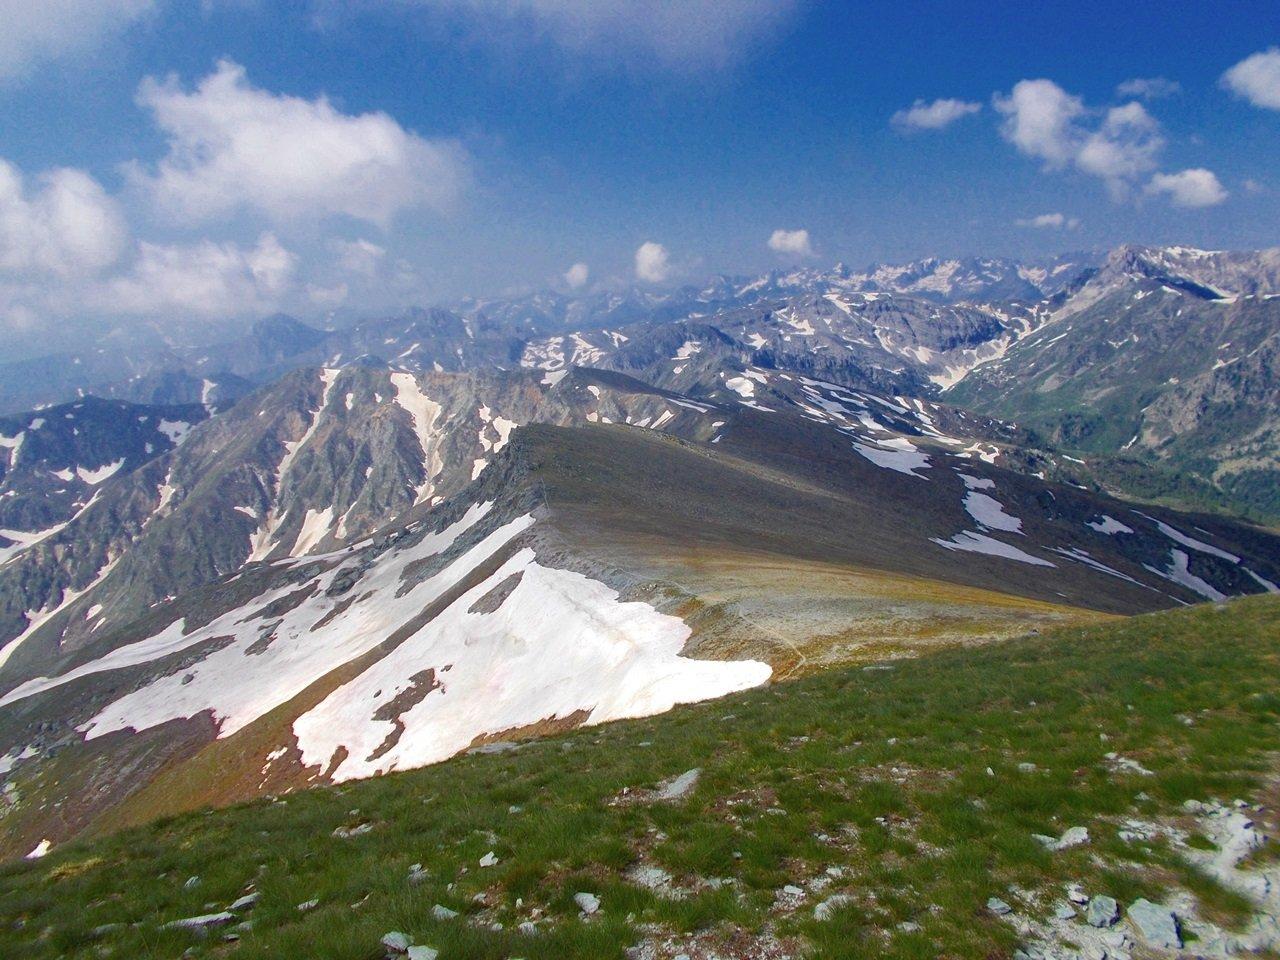 la cresta Sibolet-Tempesta